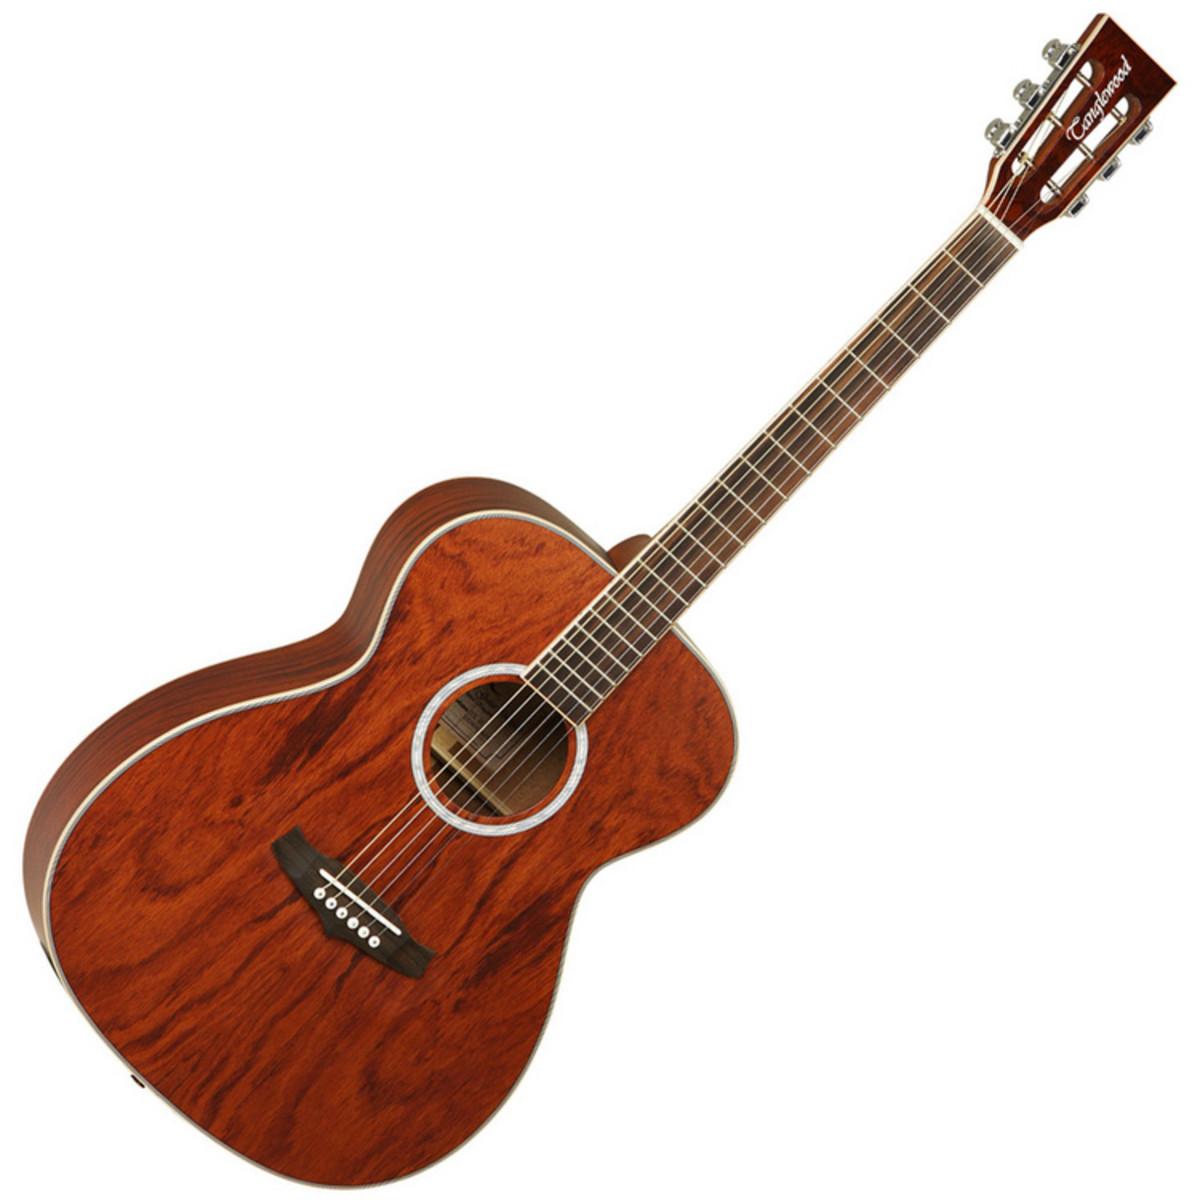 Evoluci n de tanglewood ex ticas tfa re gran guitarra for The tanglewood